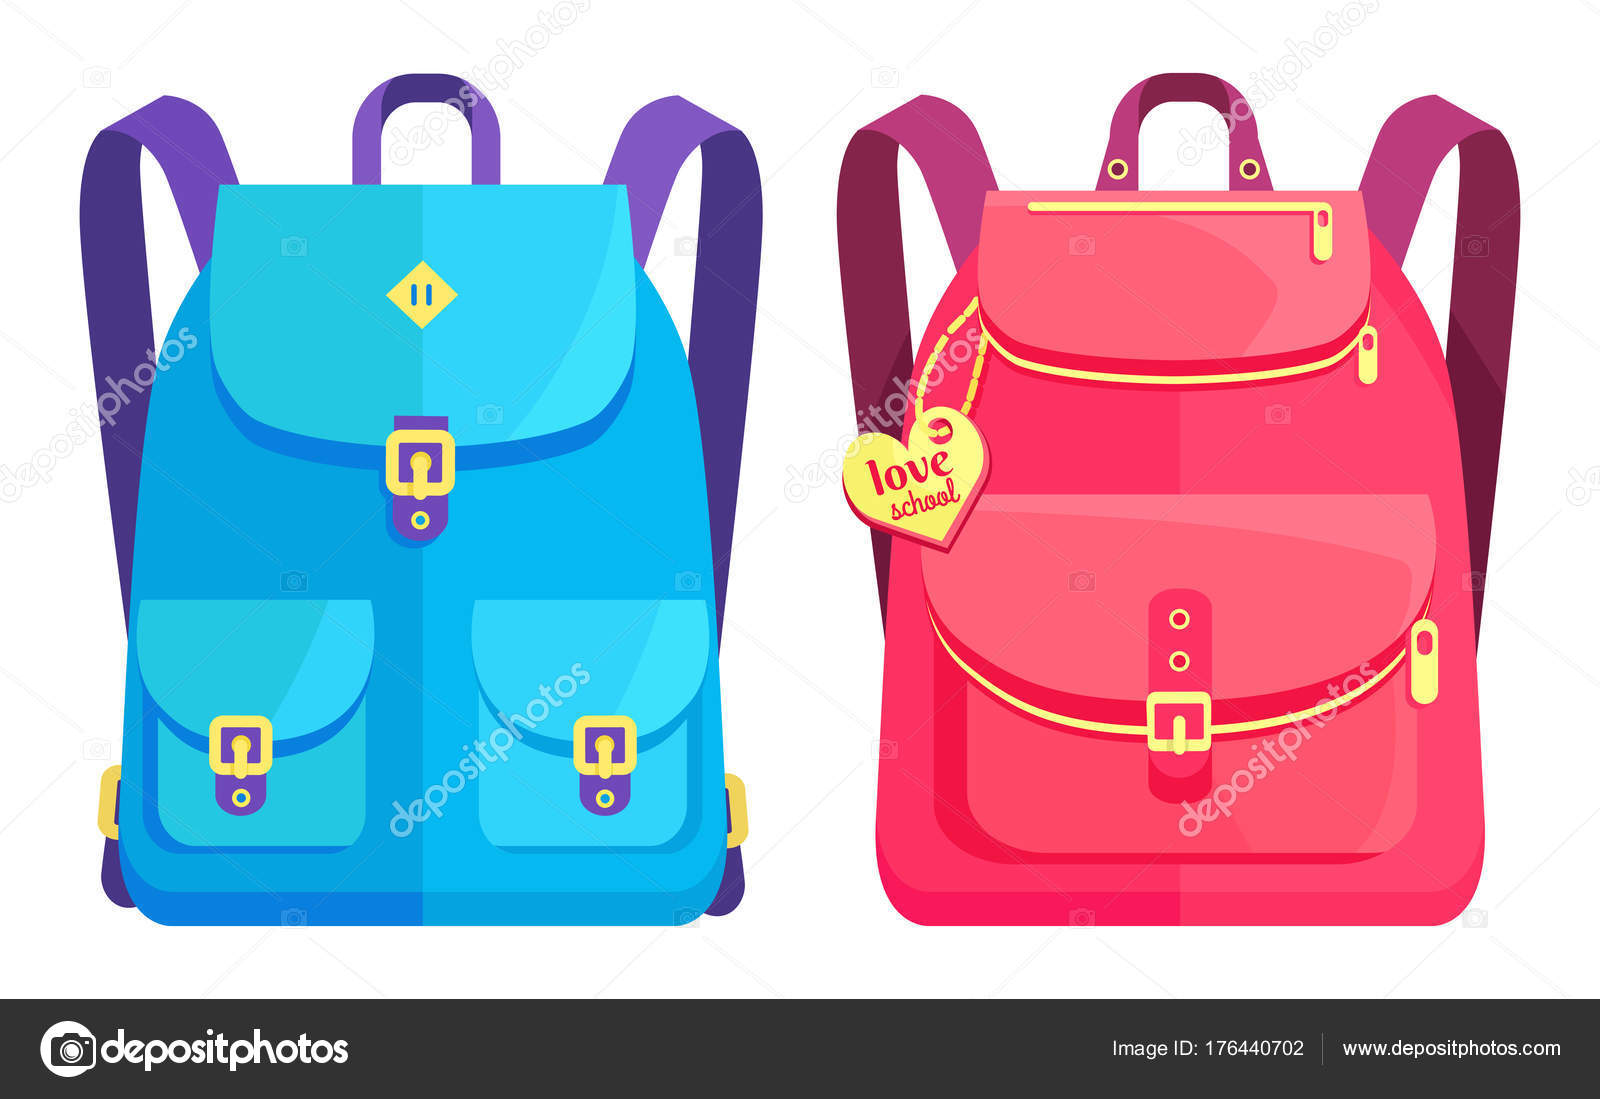 5fd6a4732d Σακίδια Unisex μπλε και ροζ με τσέπες — Διανυσματικό Αρχείο ...